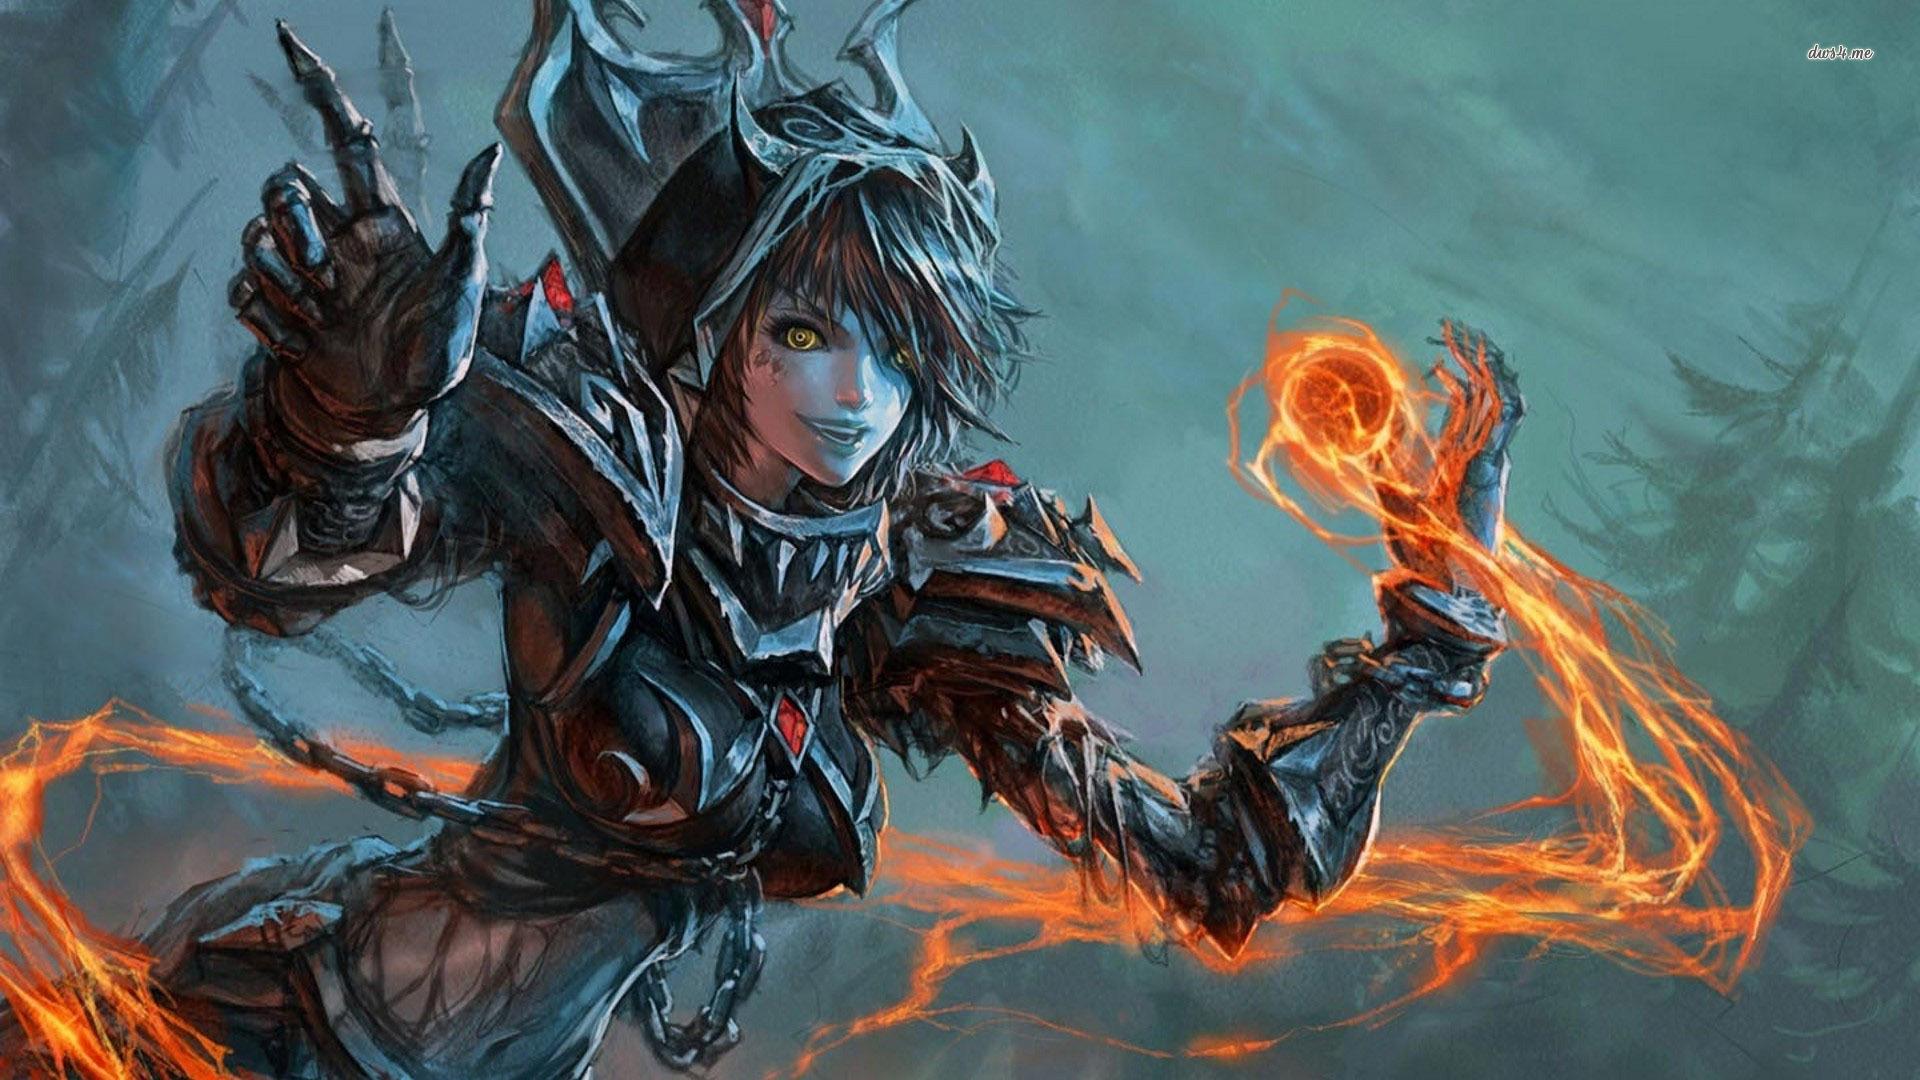 World Of Warcraft Desktop Wallpaper Posted By Christopher Peltier